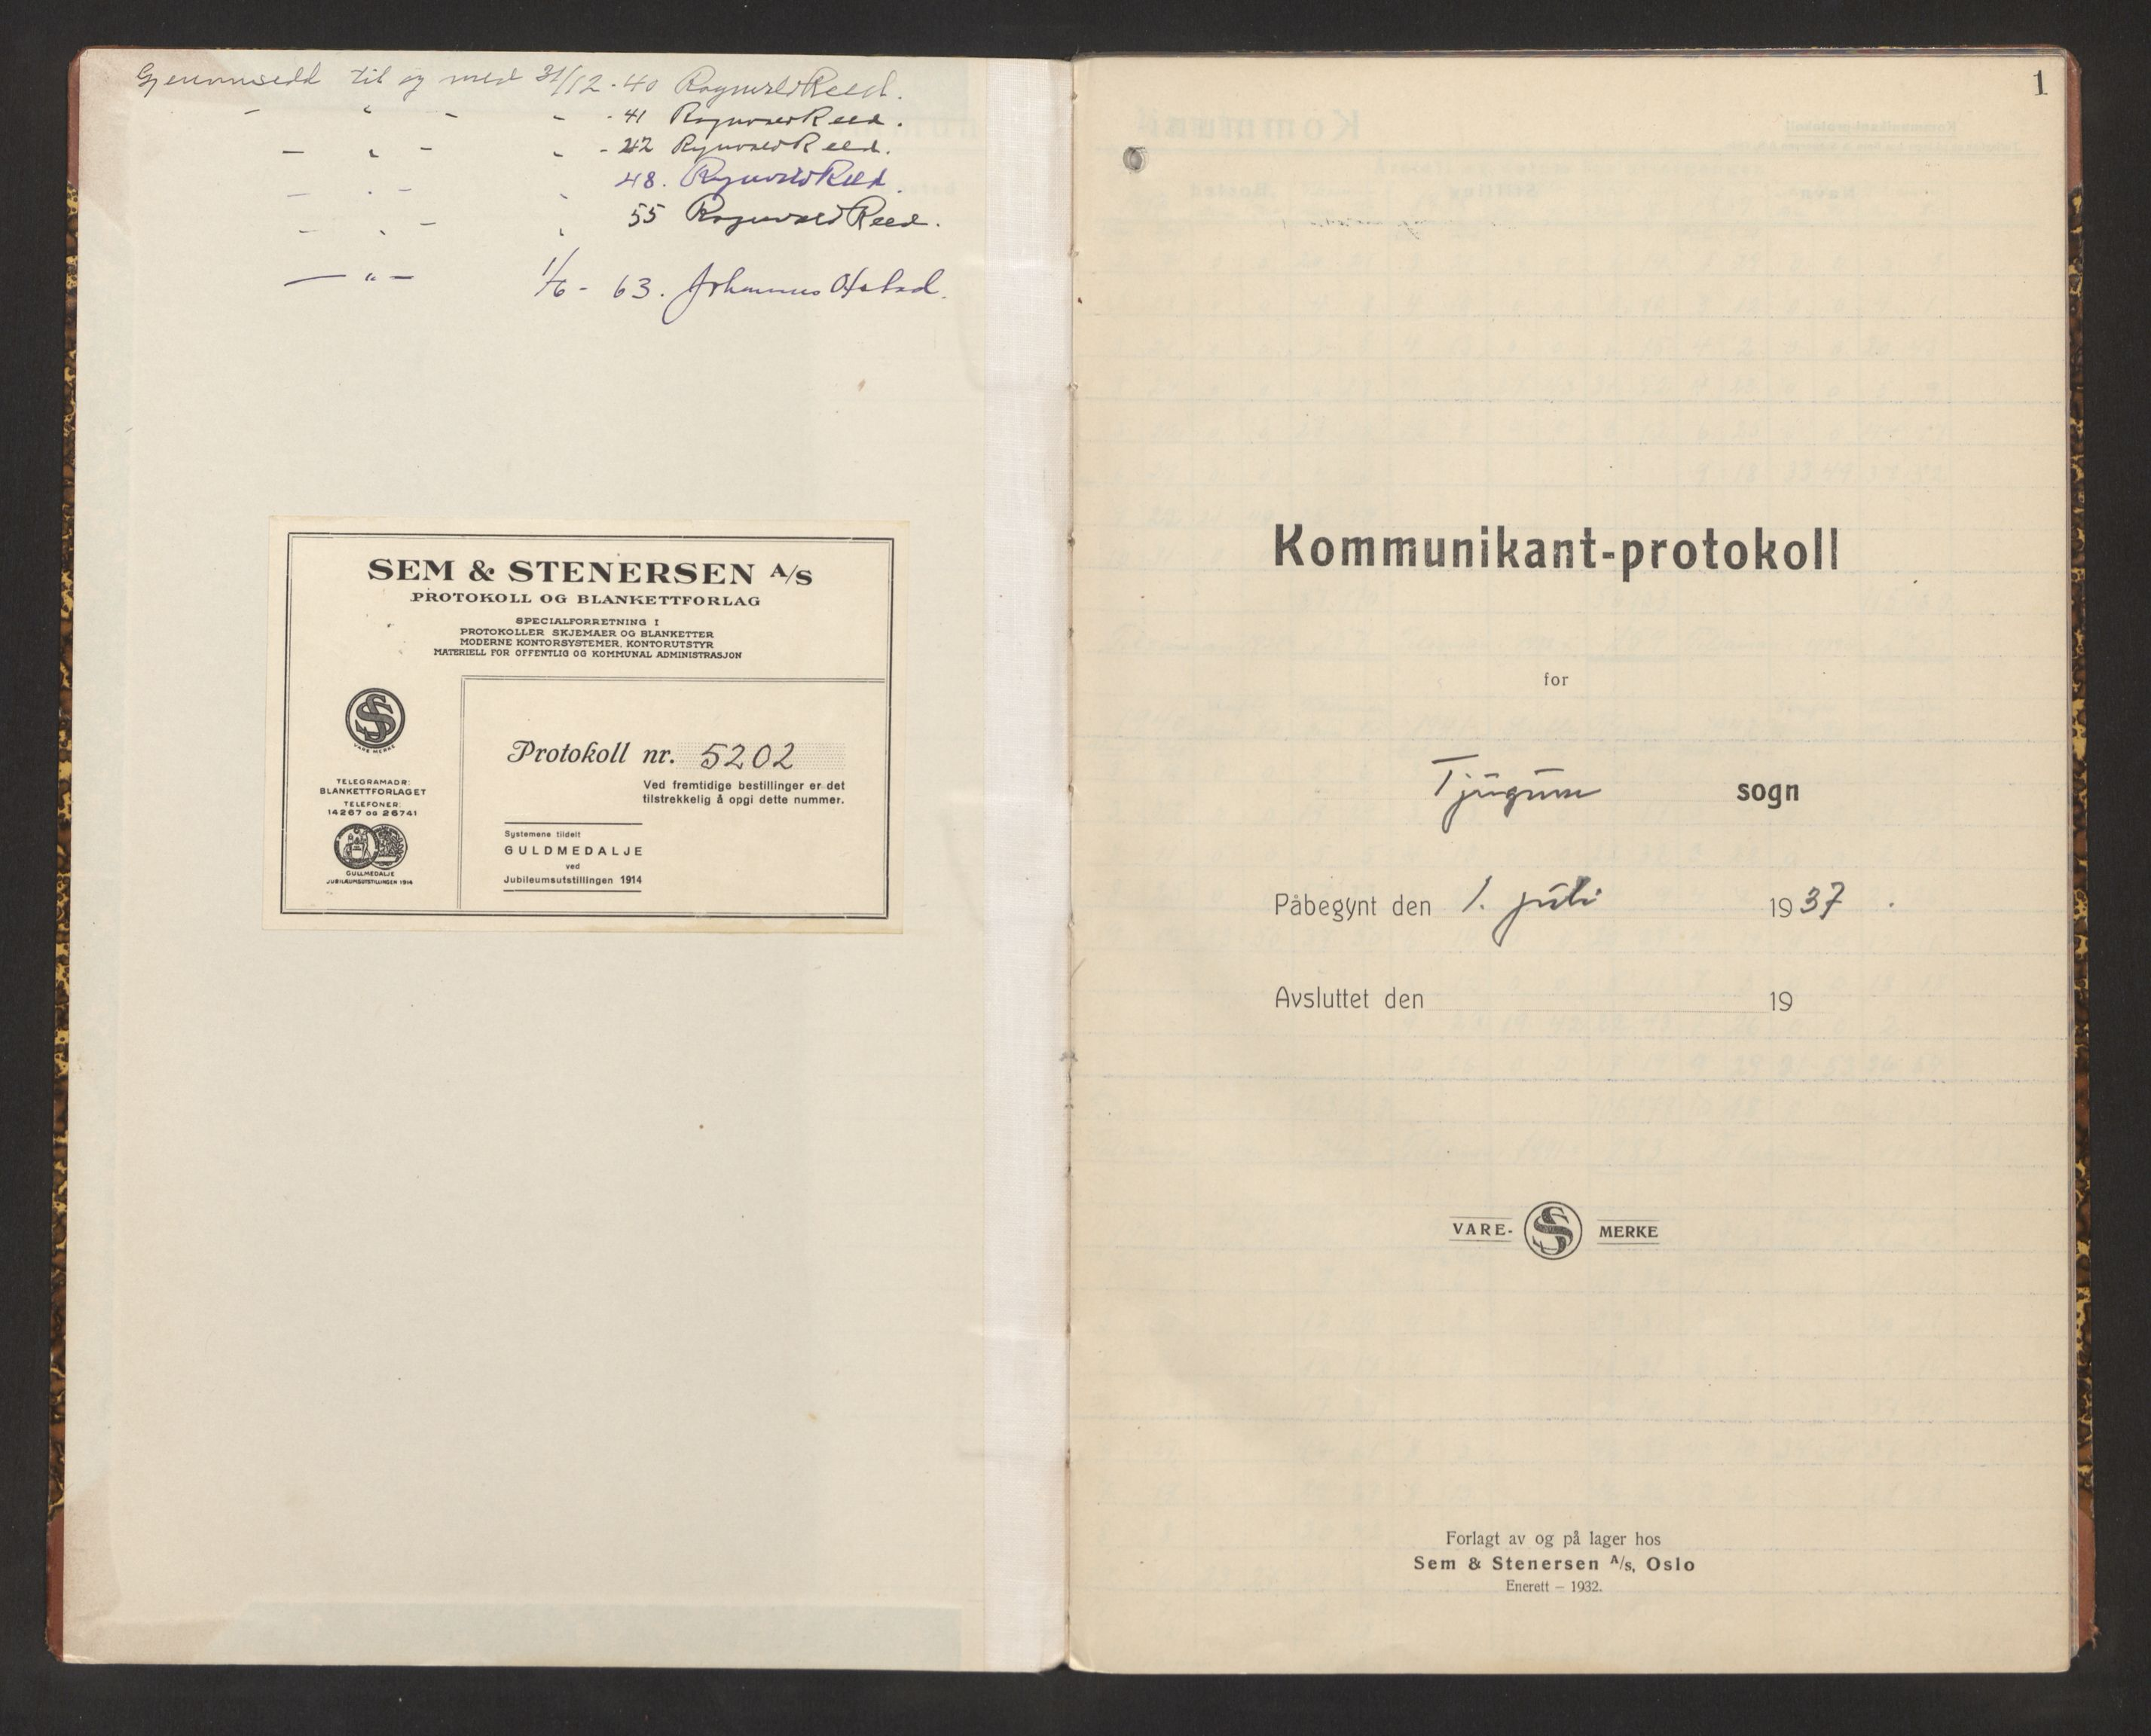 SAB, Balestrand Sokneprestembete, H/Hb/Hba/L0004: Kommunikantprotokoll nr. A 4, 1937-1964, s. 1